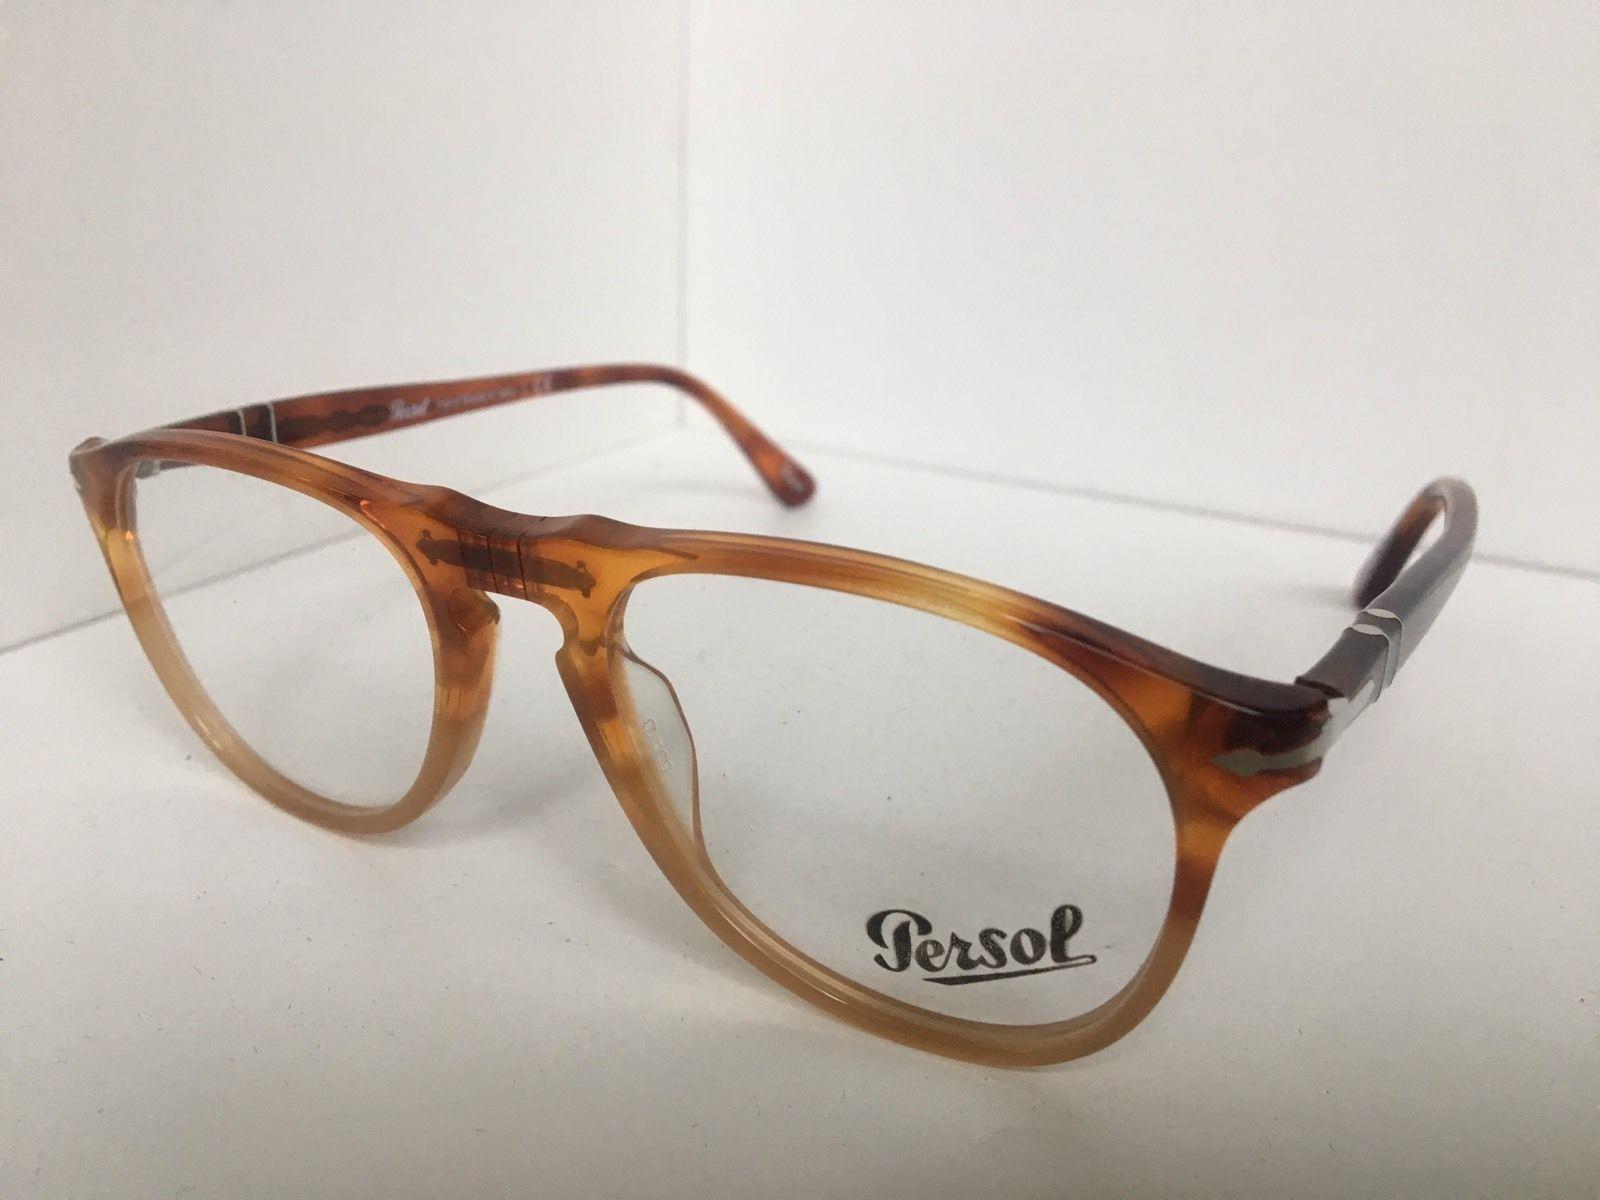 3d12405c2e371 New Persol 9649-V 1025 Amber Resina e Sale and 50 similar items. S l1600